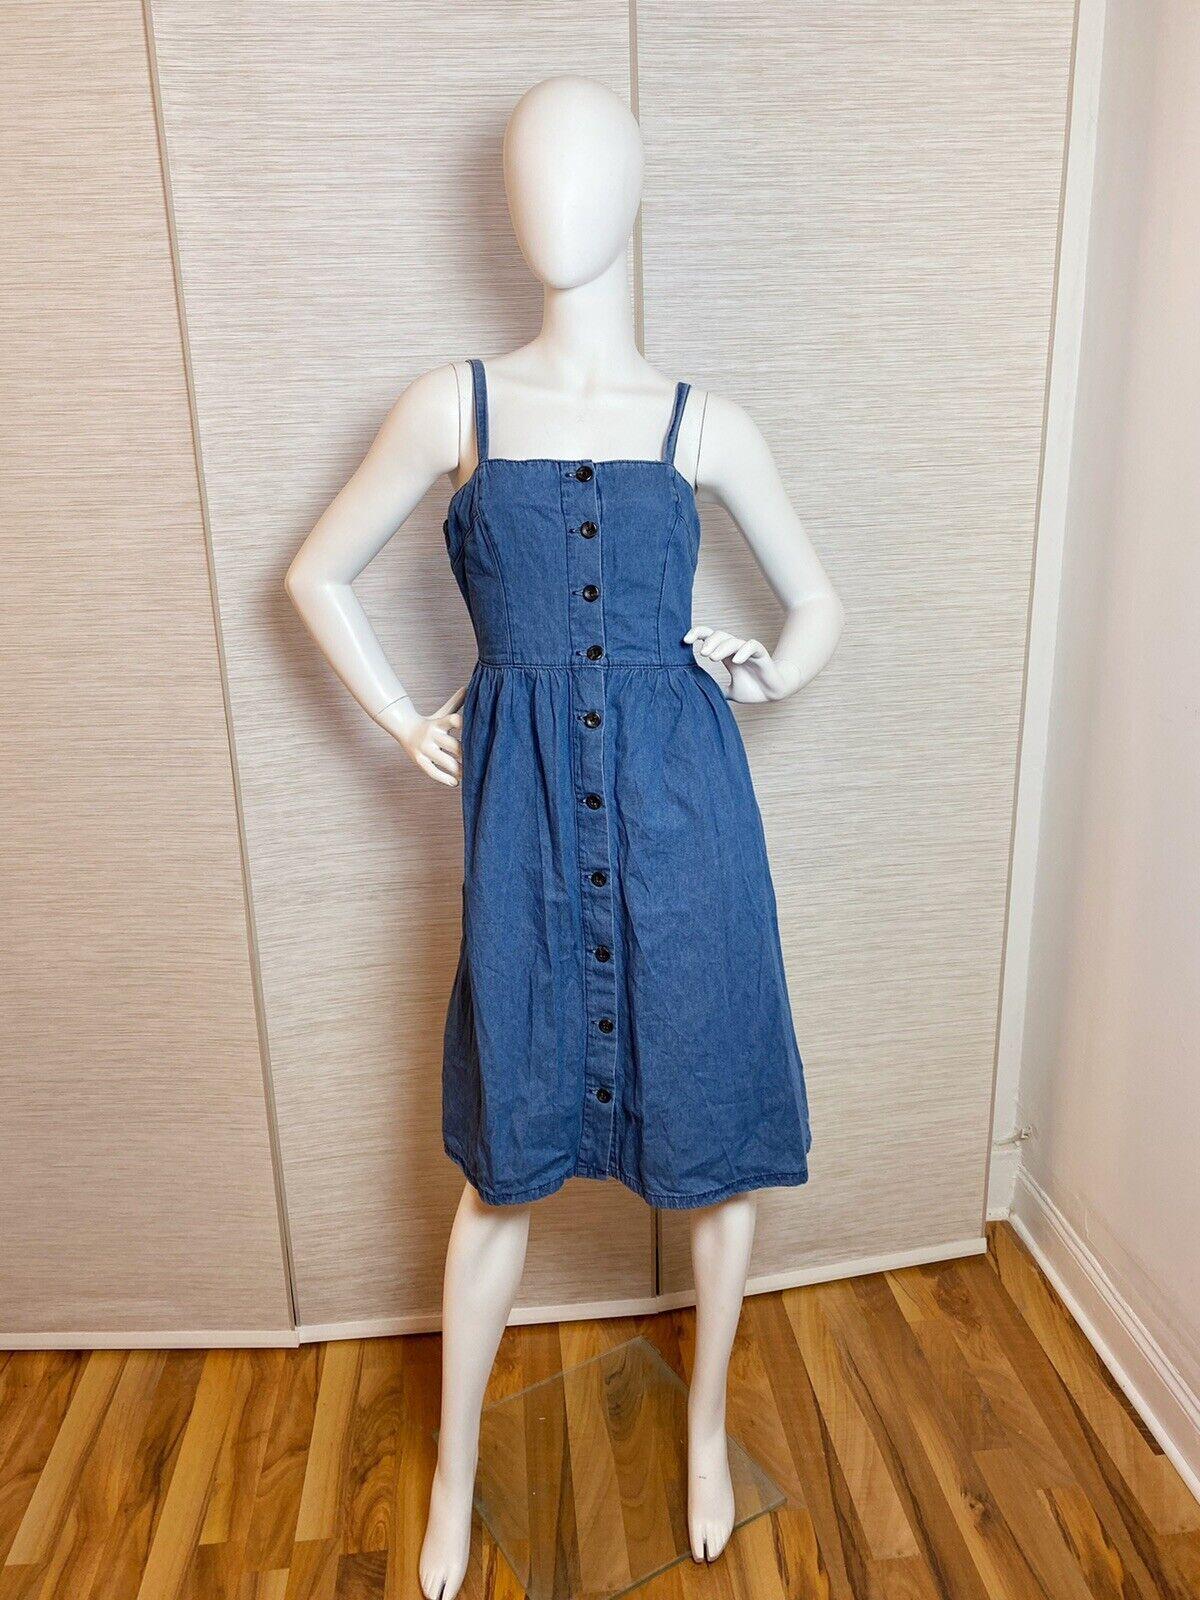 ETAM Paris Jeanskleid Blau Retro Gr 36/38 Jeans Denim Kleid S Wie Neu! France